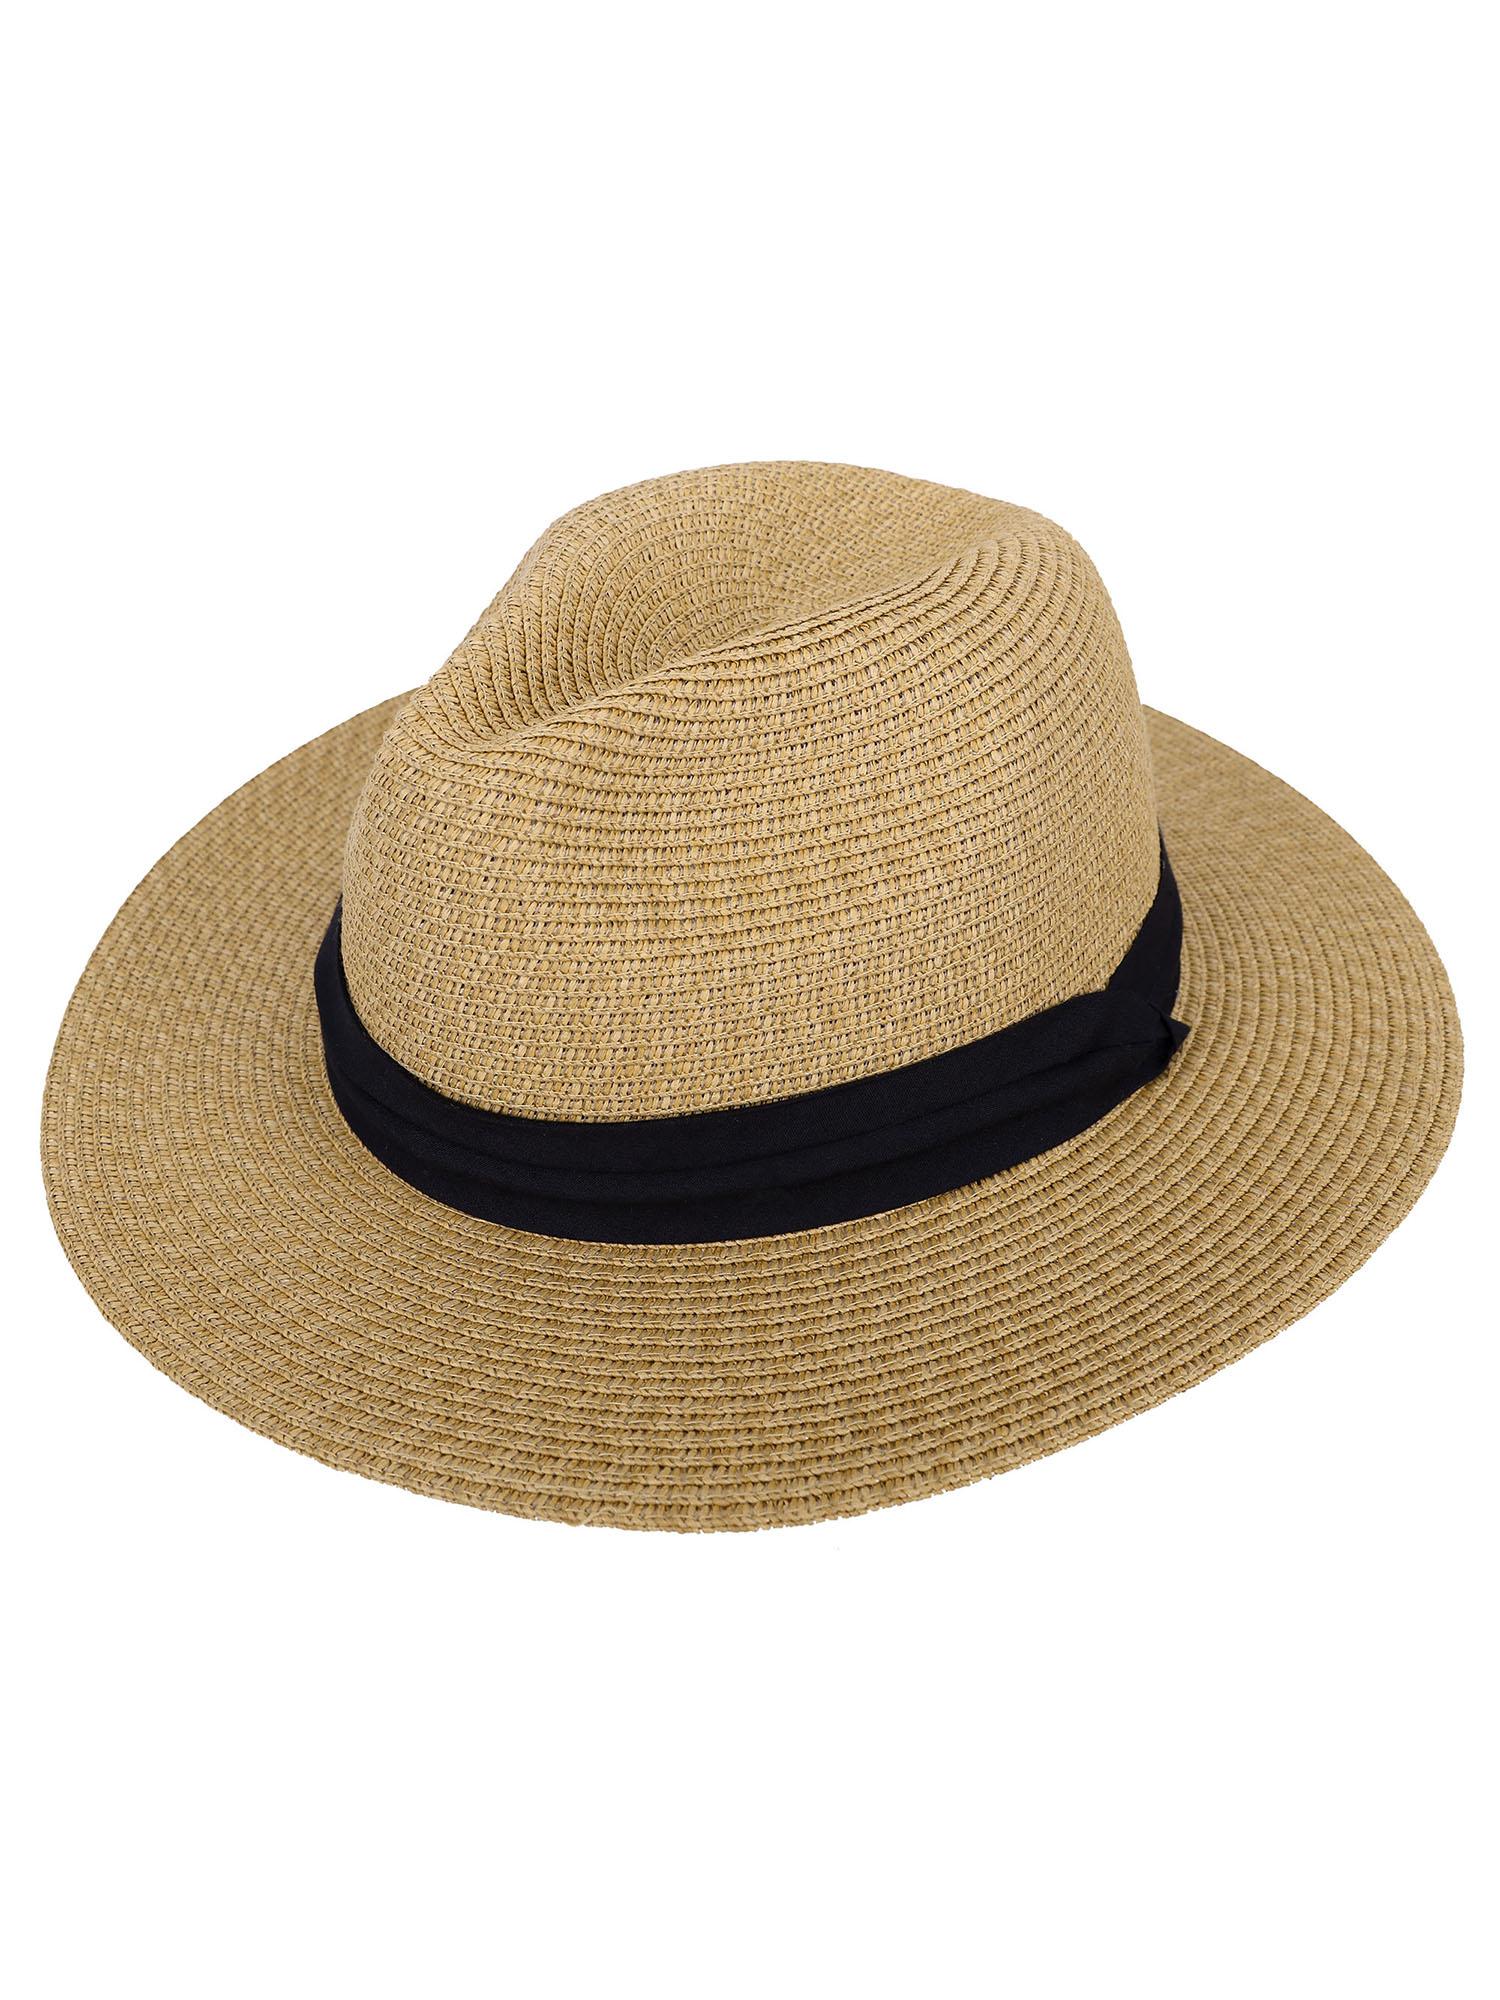 fb5dc07f5344f1 Simplicity - Panama Straw Hat Men Women's Wide Brim Packable Roll up Fedora Beach  Sun Hat, Brown - Walmart.com